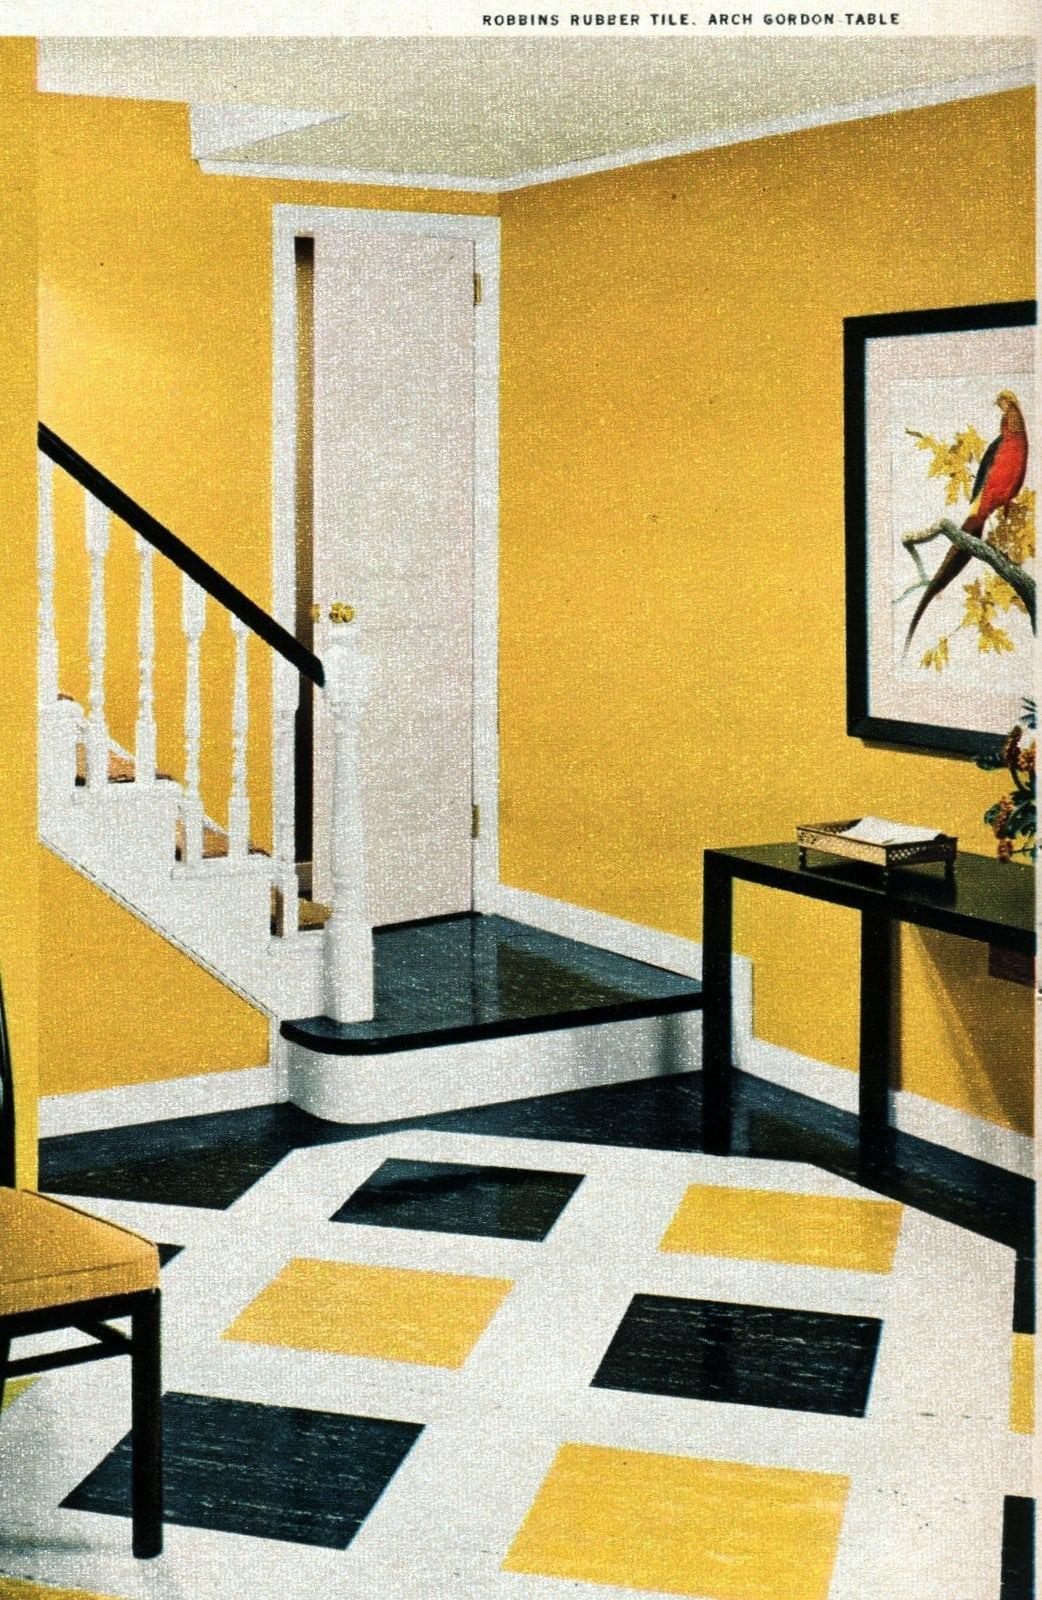 Vintage 50s home decor - Entry halls Open squares